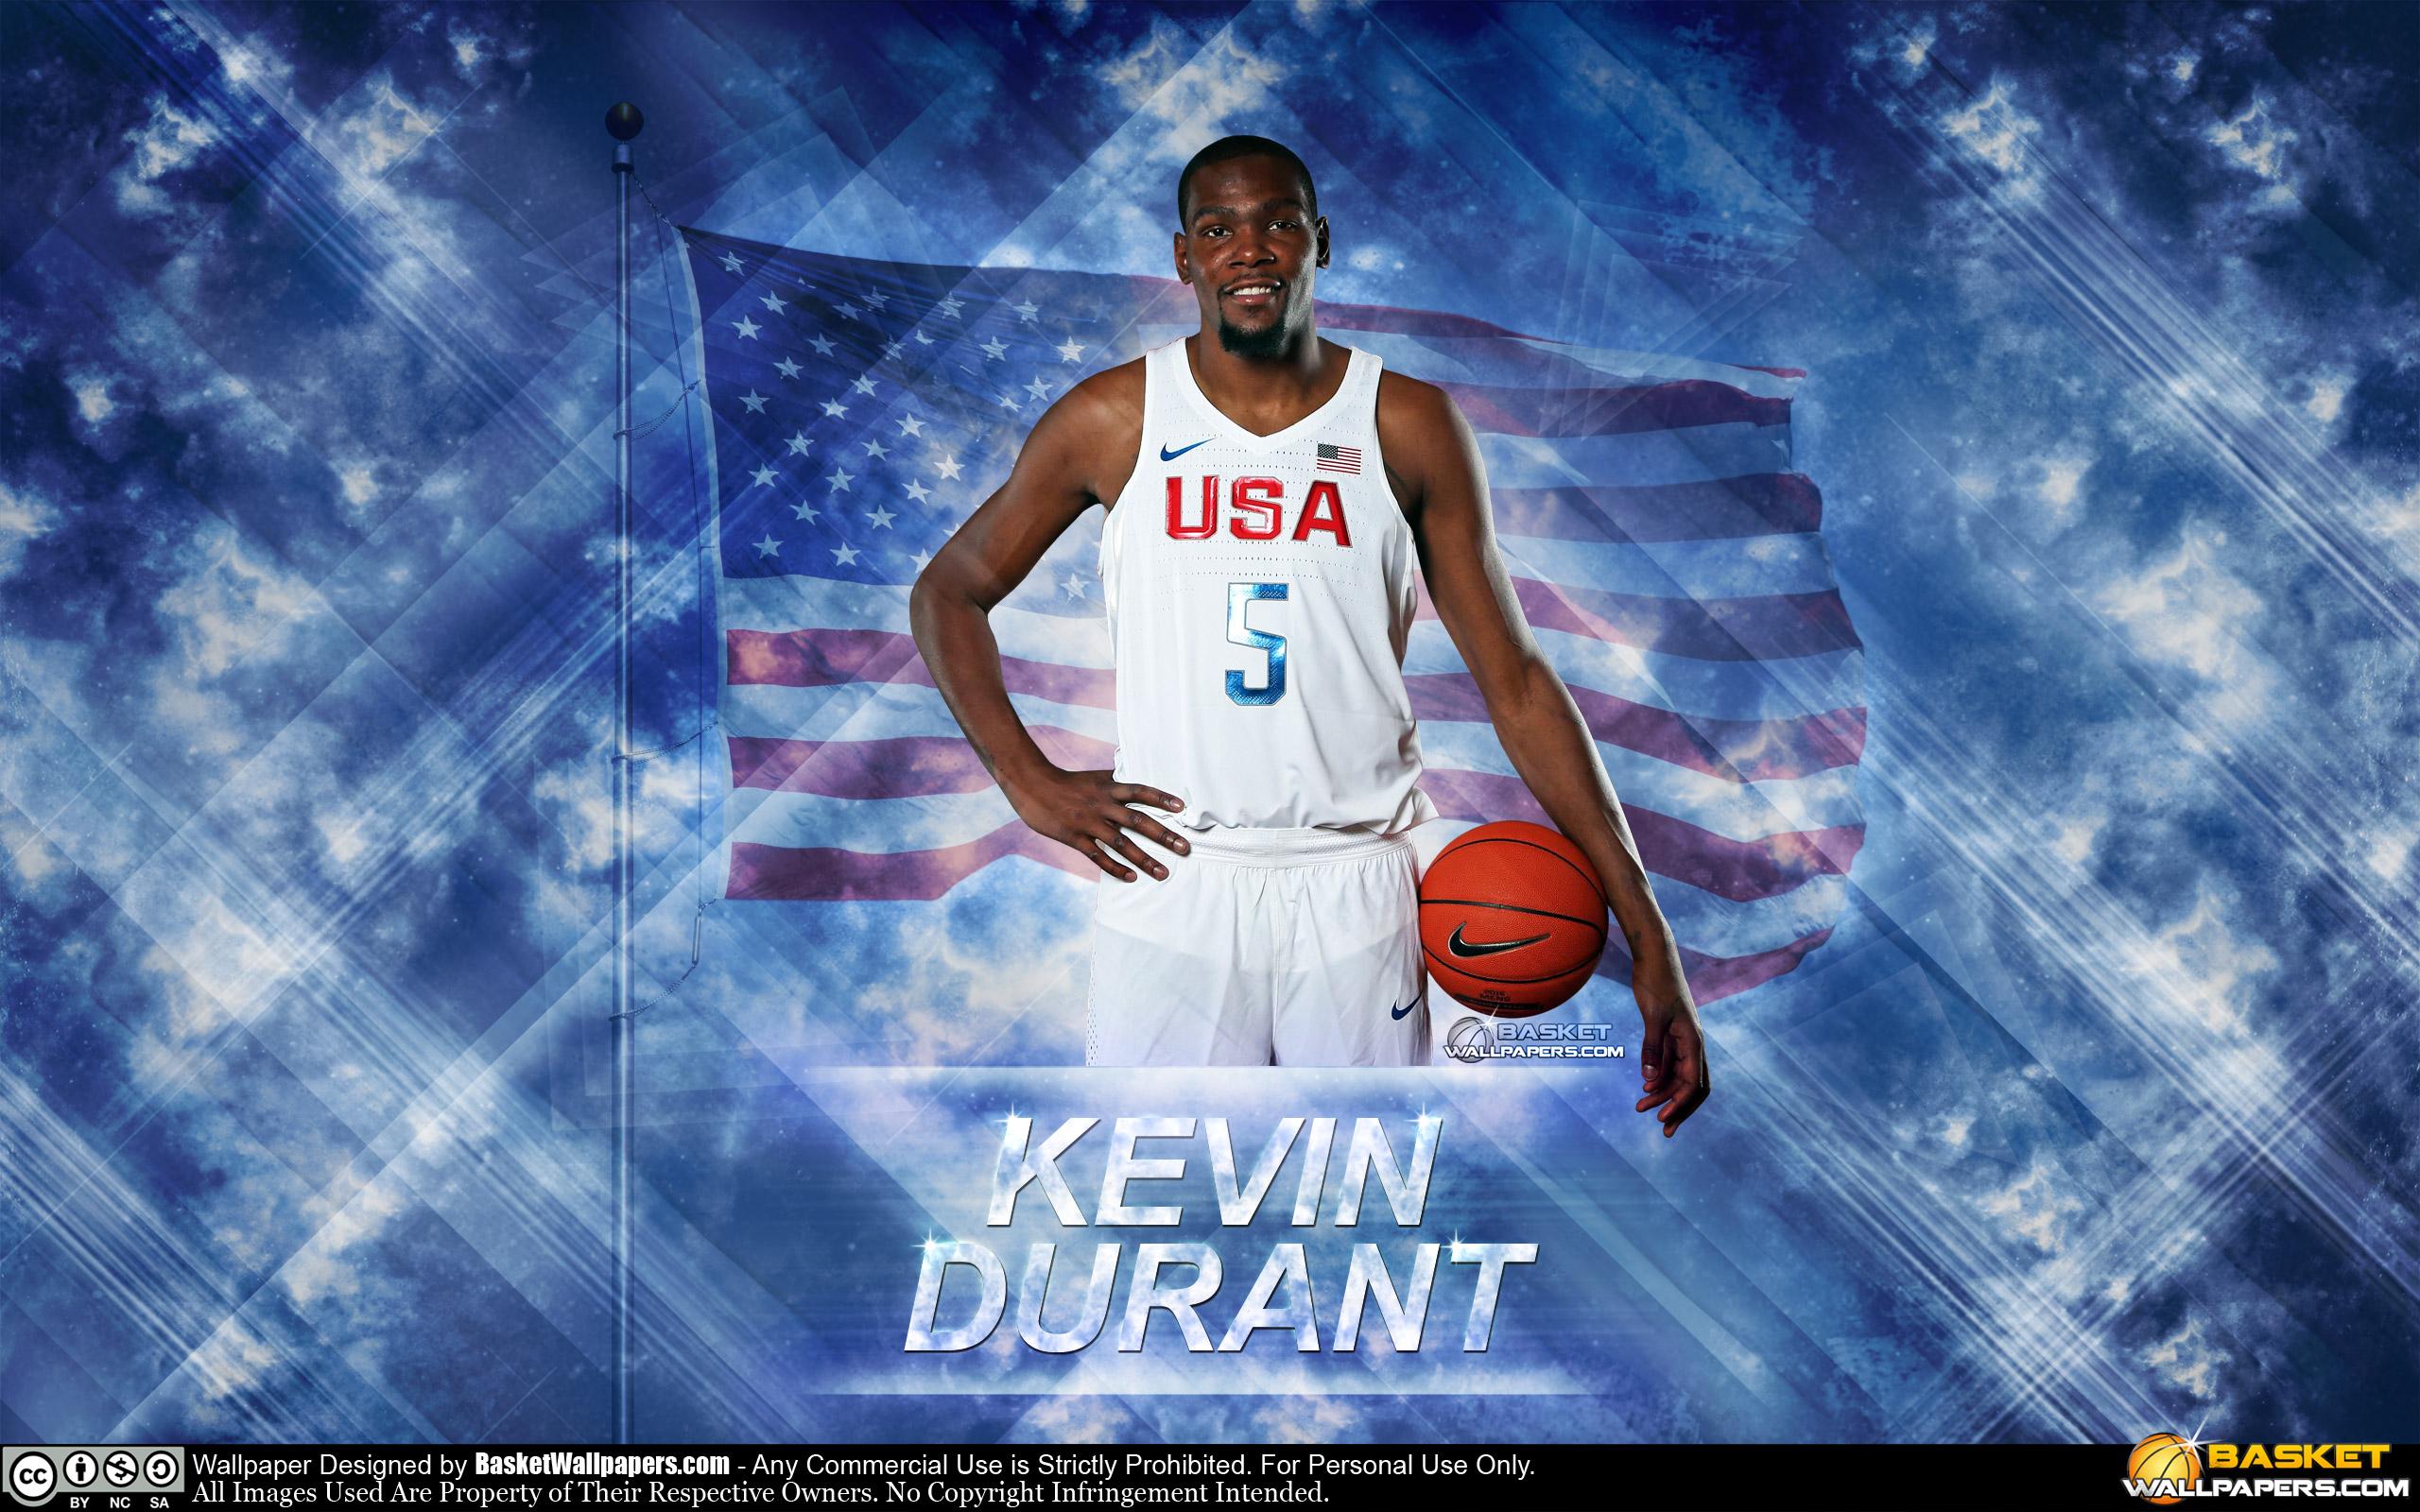 Kevin Durant USA 2016 Olympics Wallpaper Basketball 2560x1600